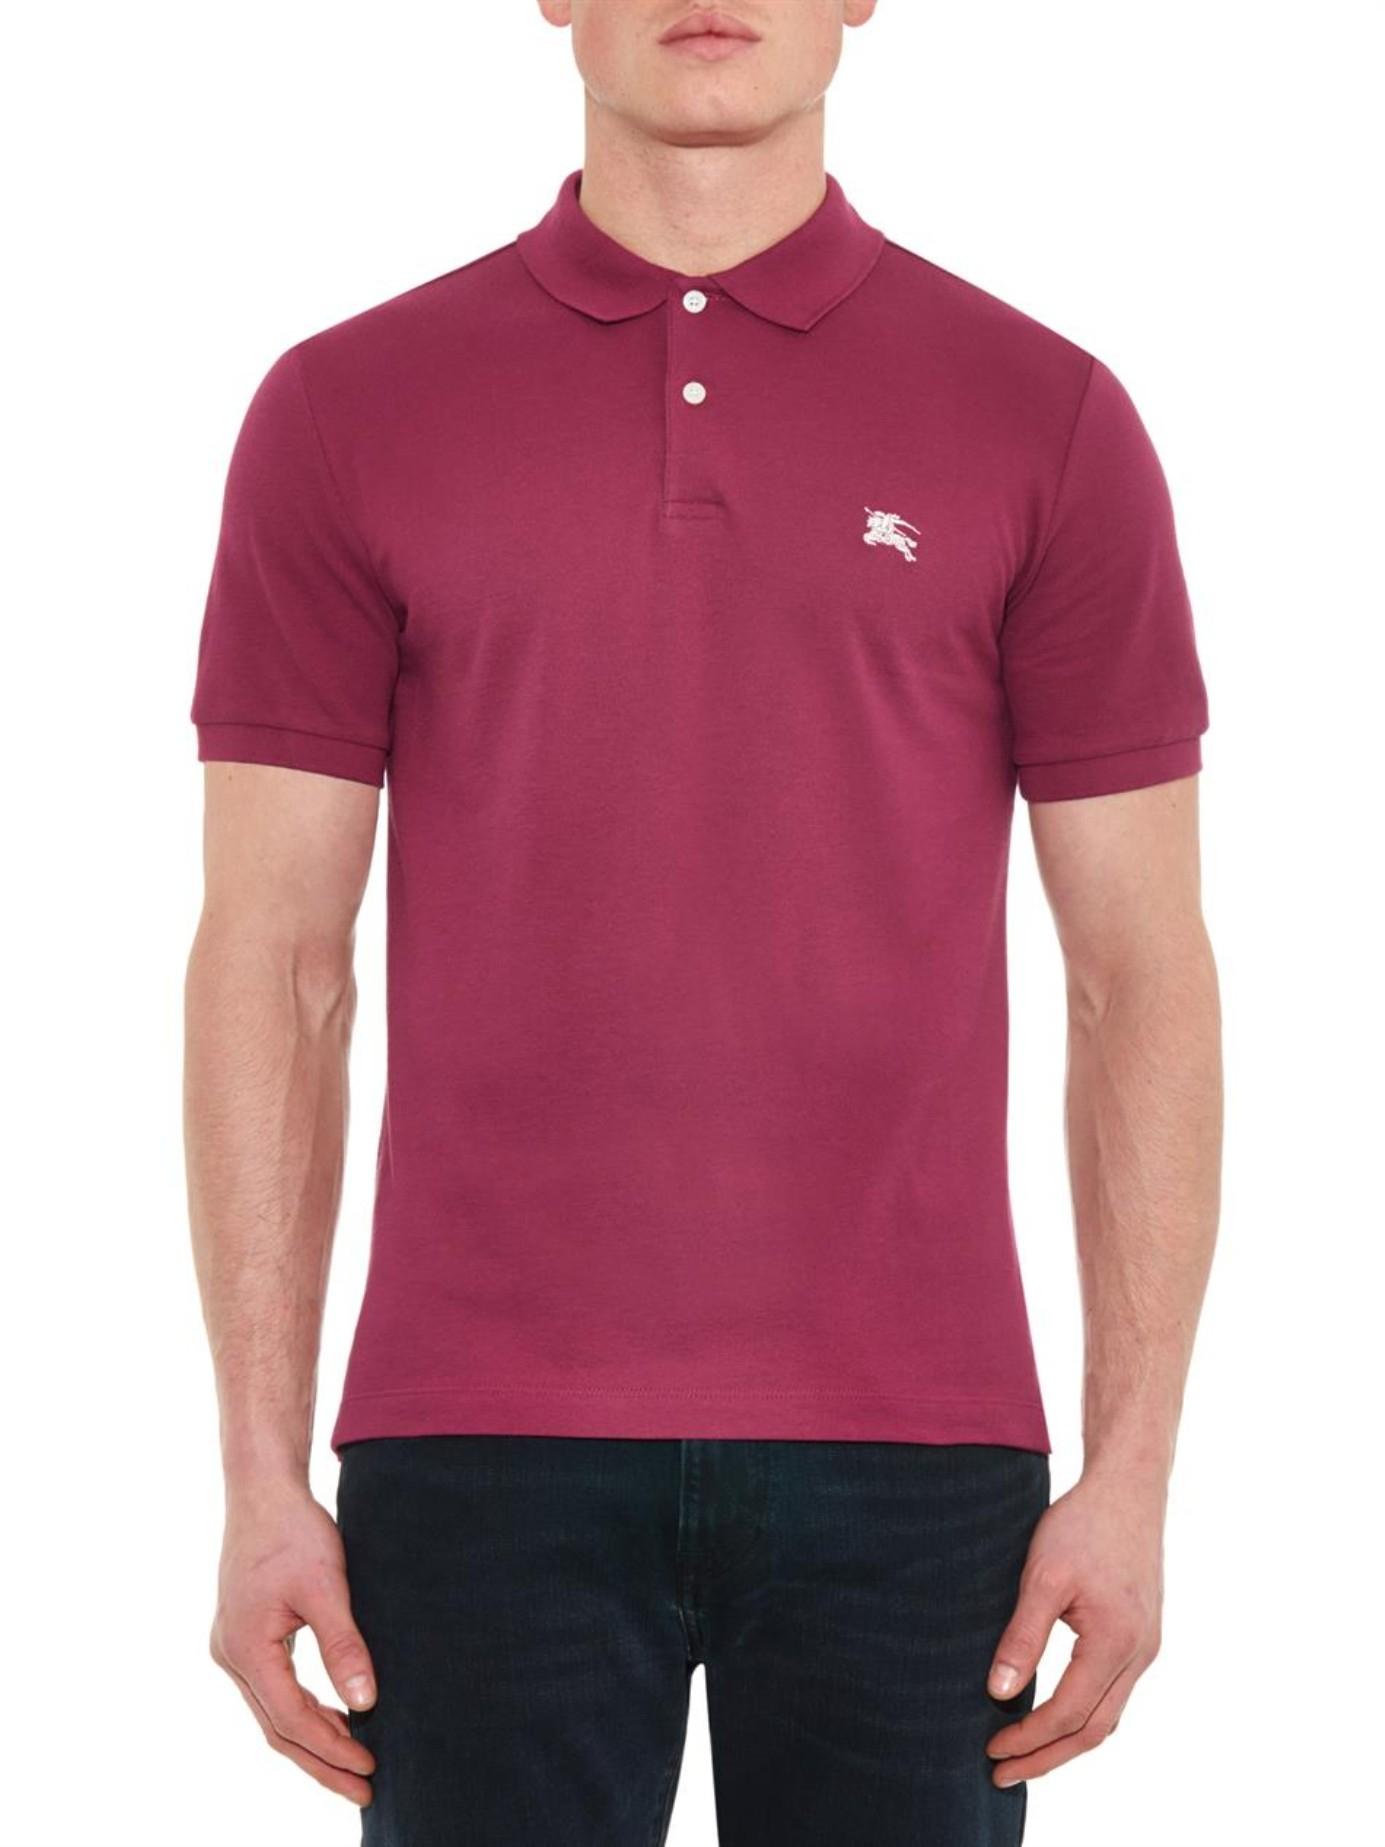 Lyst - Burberry Brit Classic Cotton-Piqué Polo Shirt in Pink for Men bdf0c6df4a8